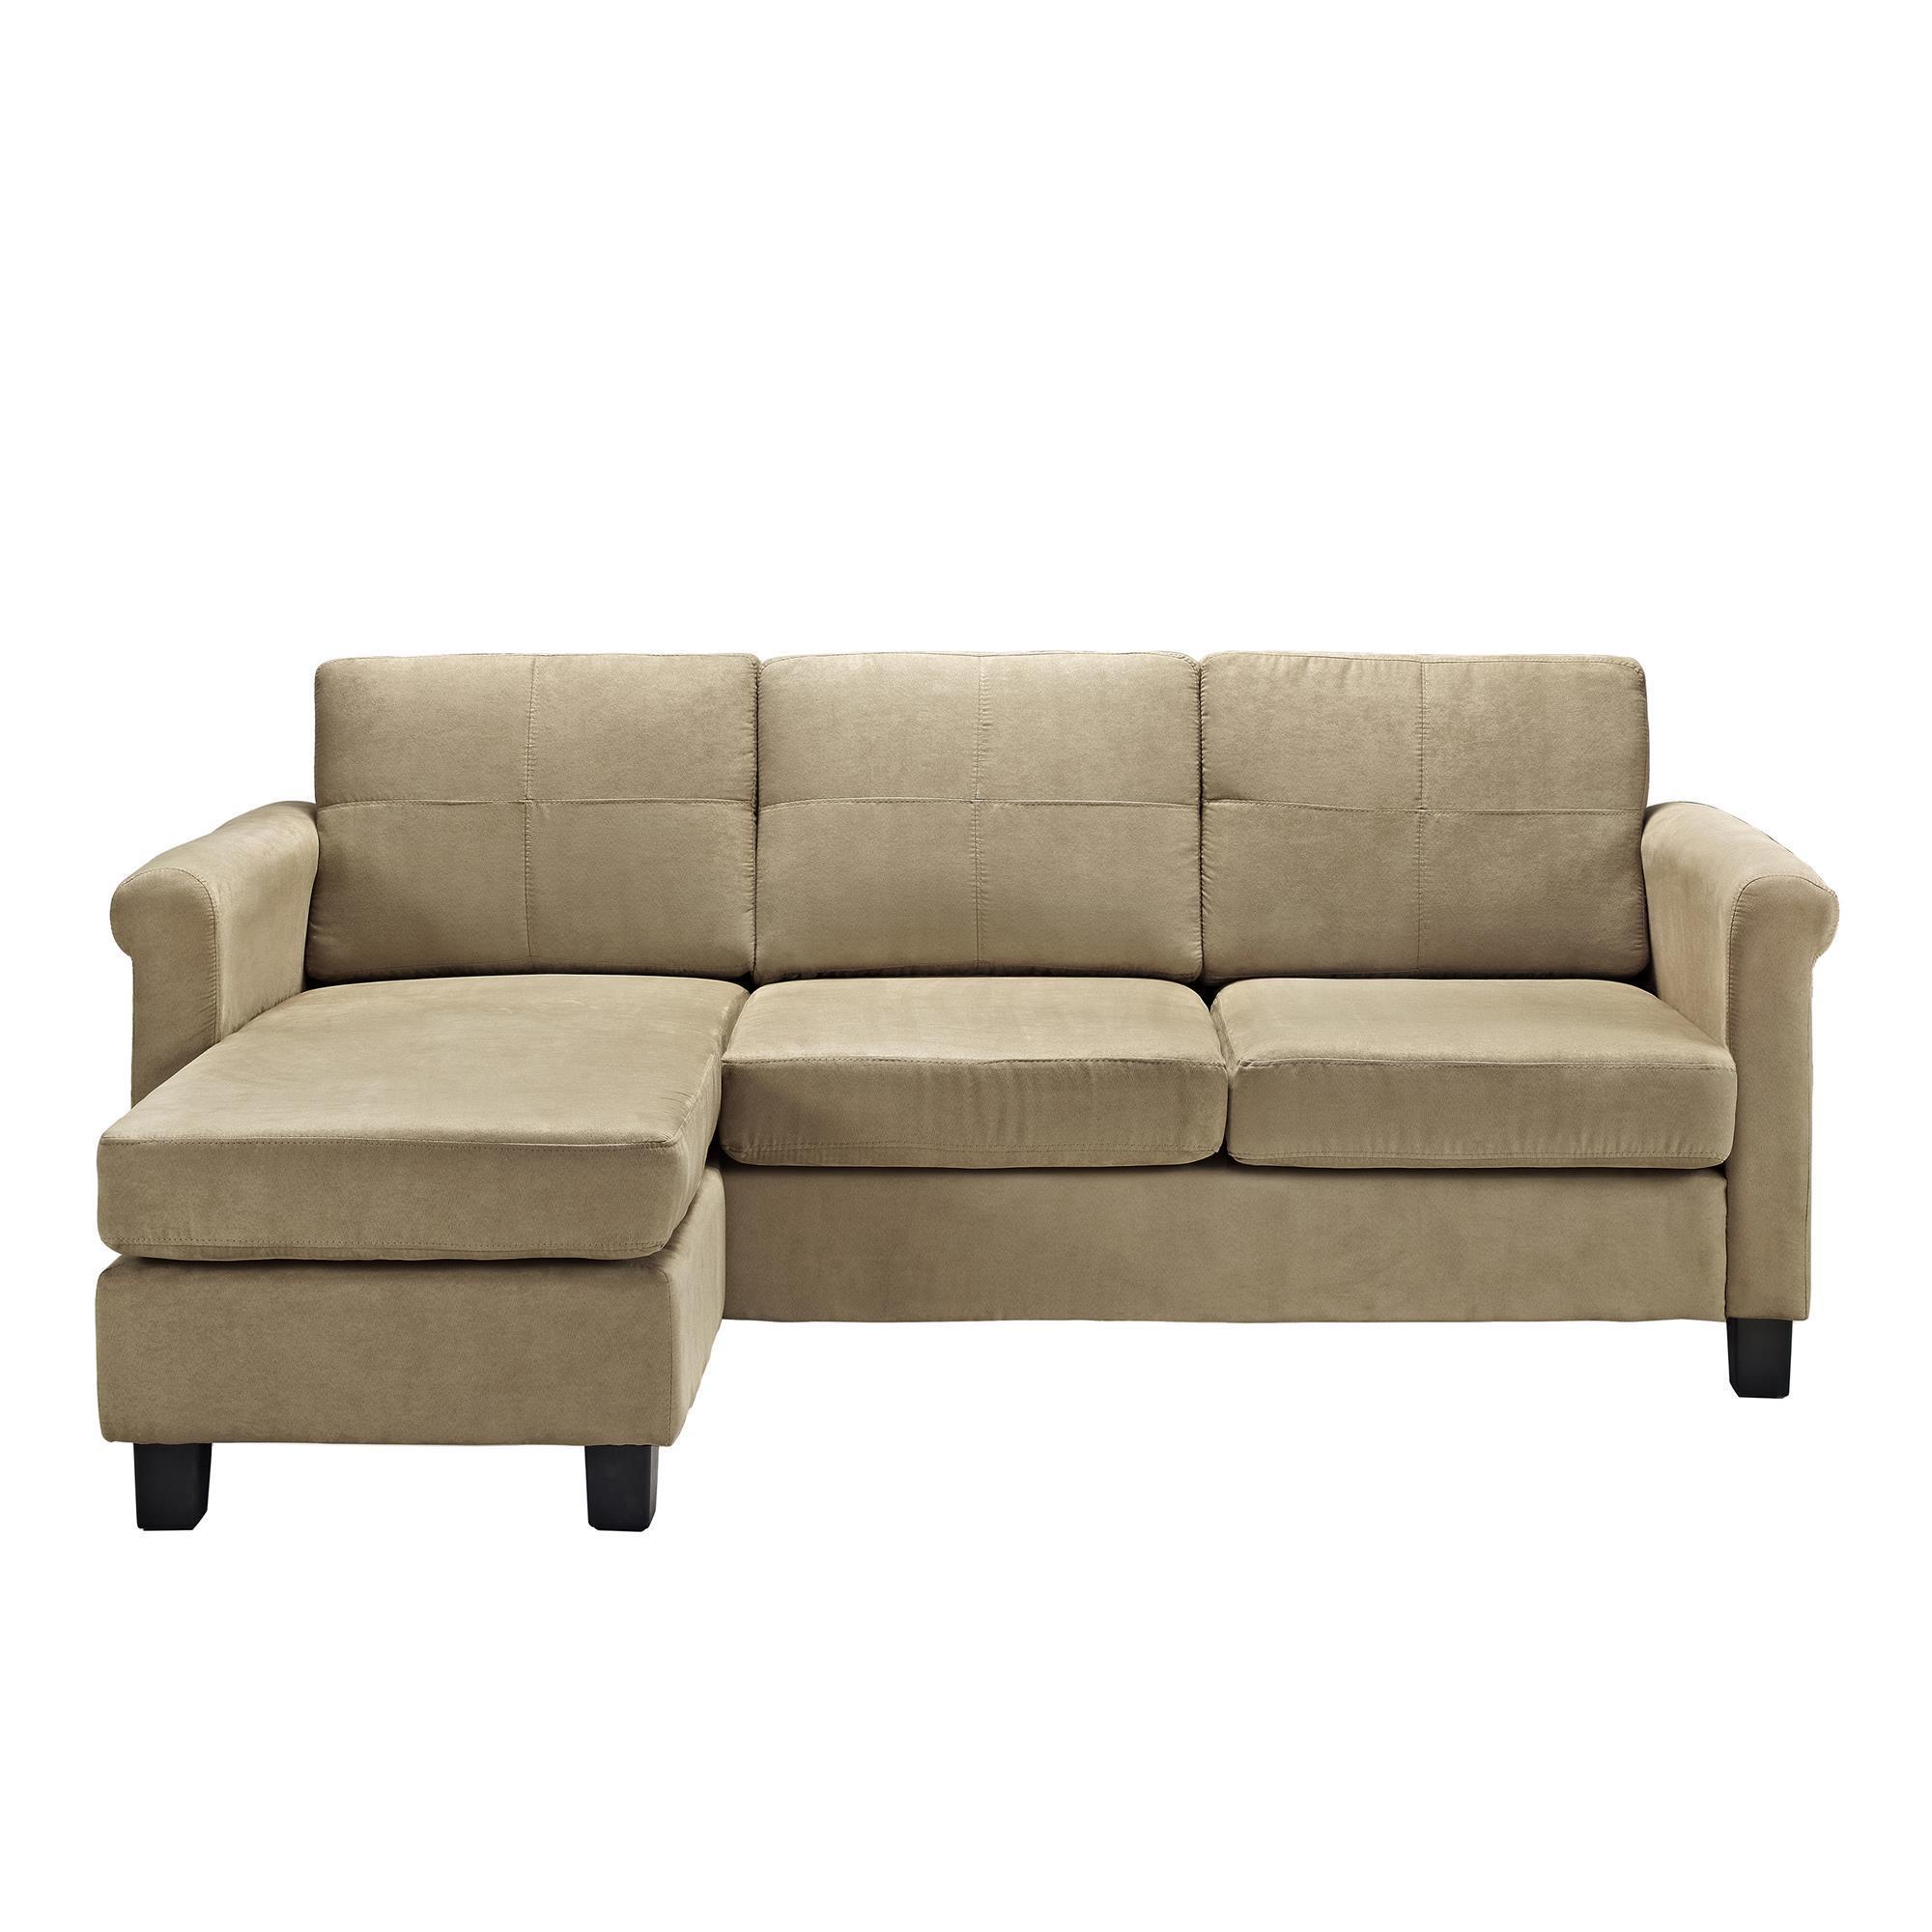 Microfiber leather sectional sofa Sofas